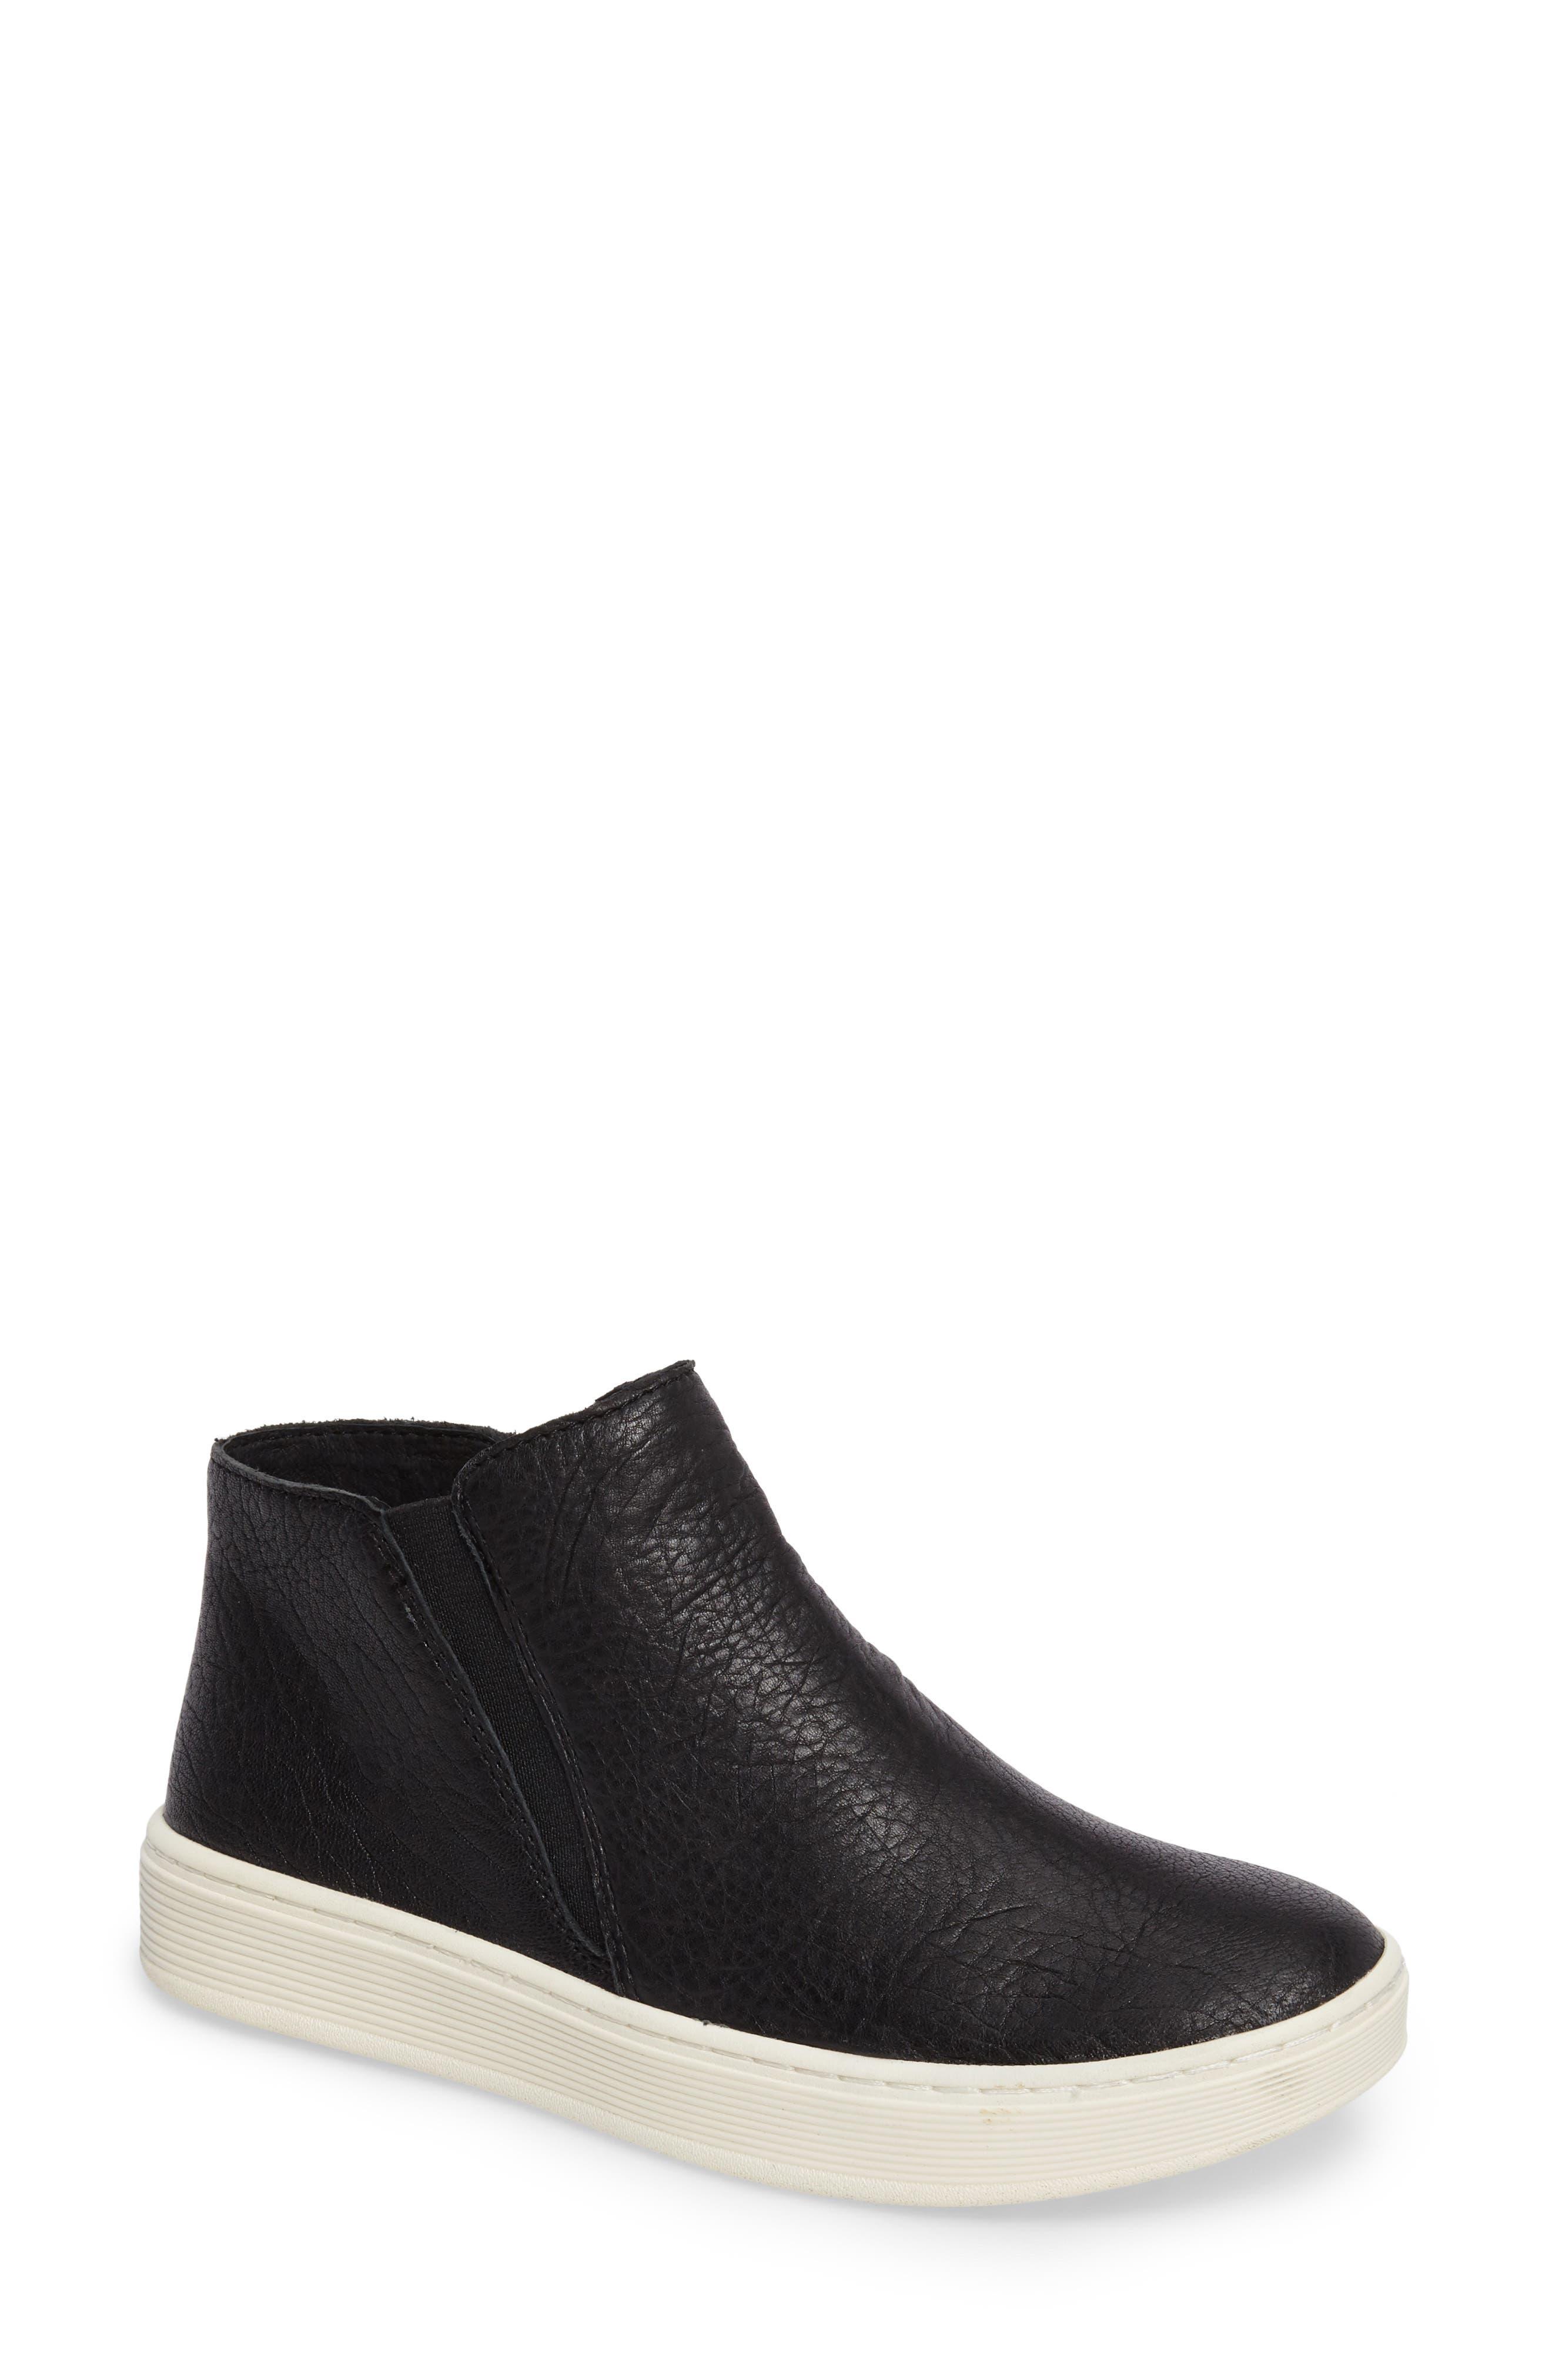 Britton Chelsea Sneaker,                         Main,                         color, BLACK LEATHER